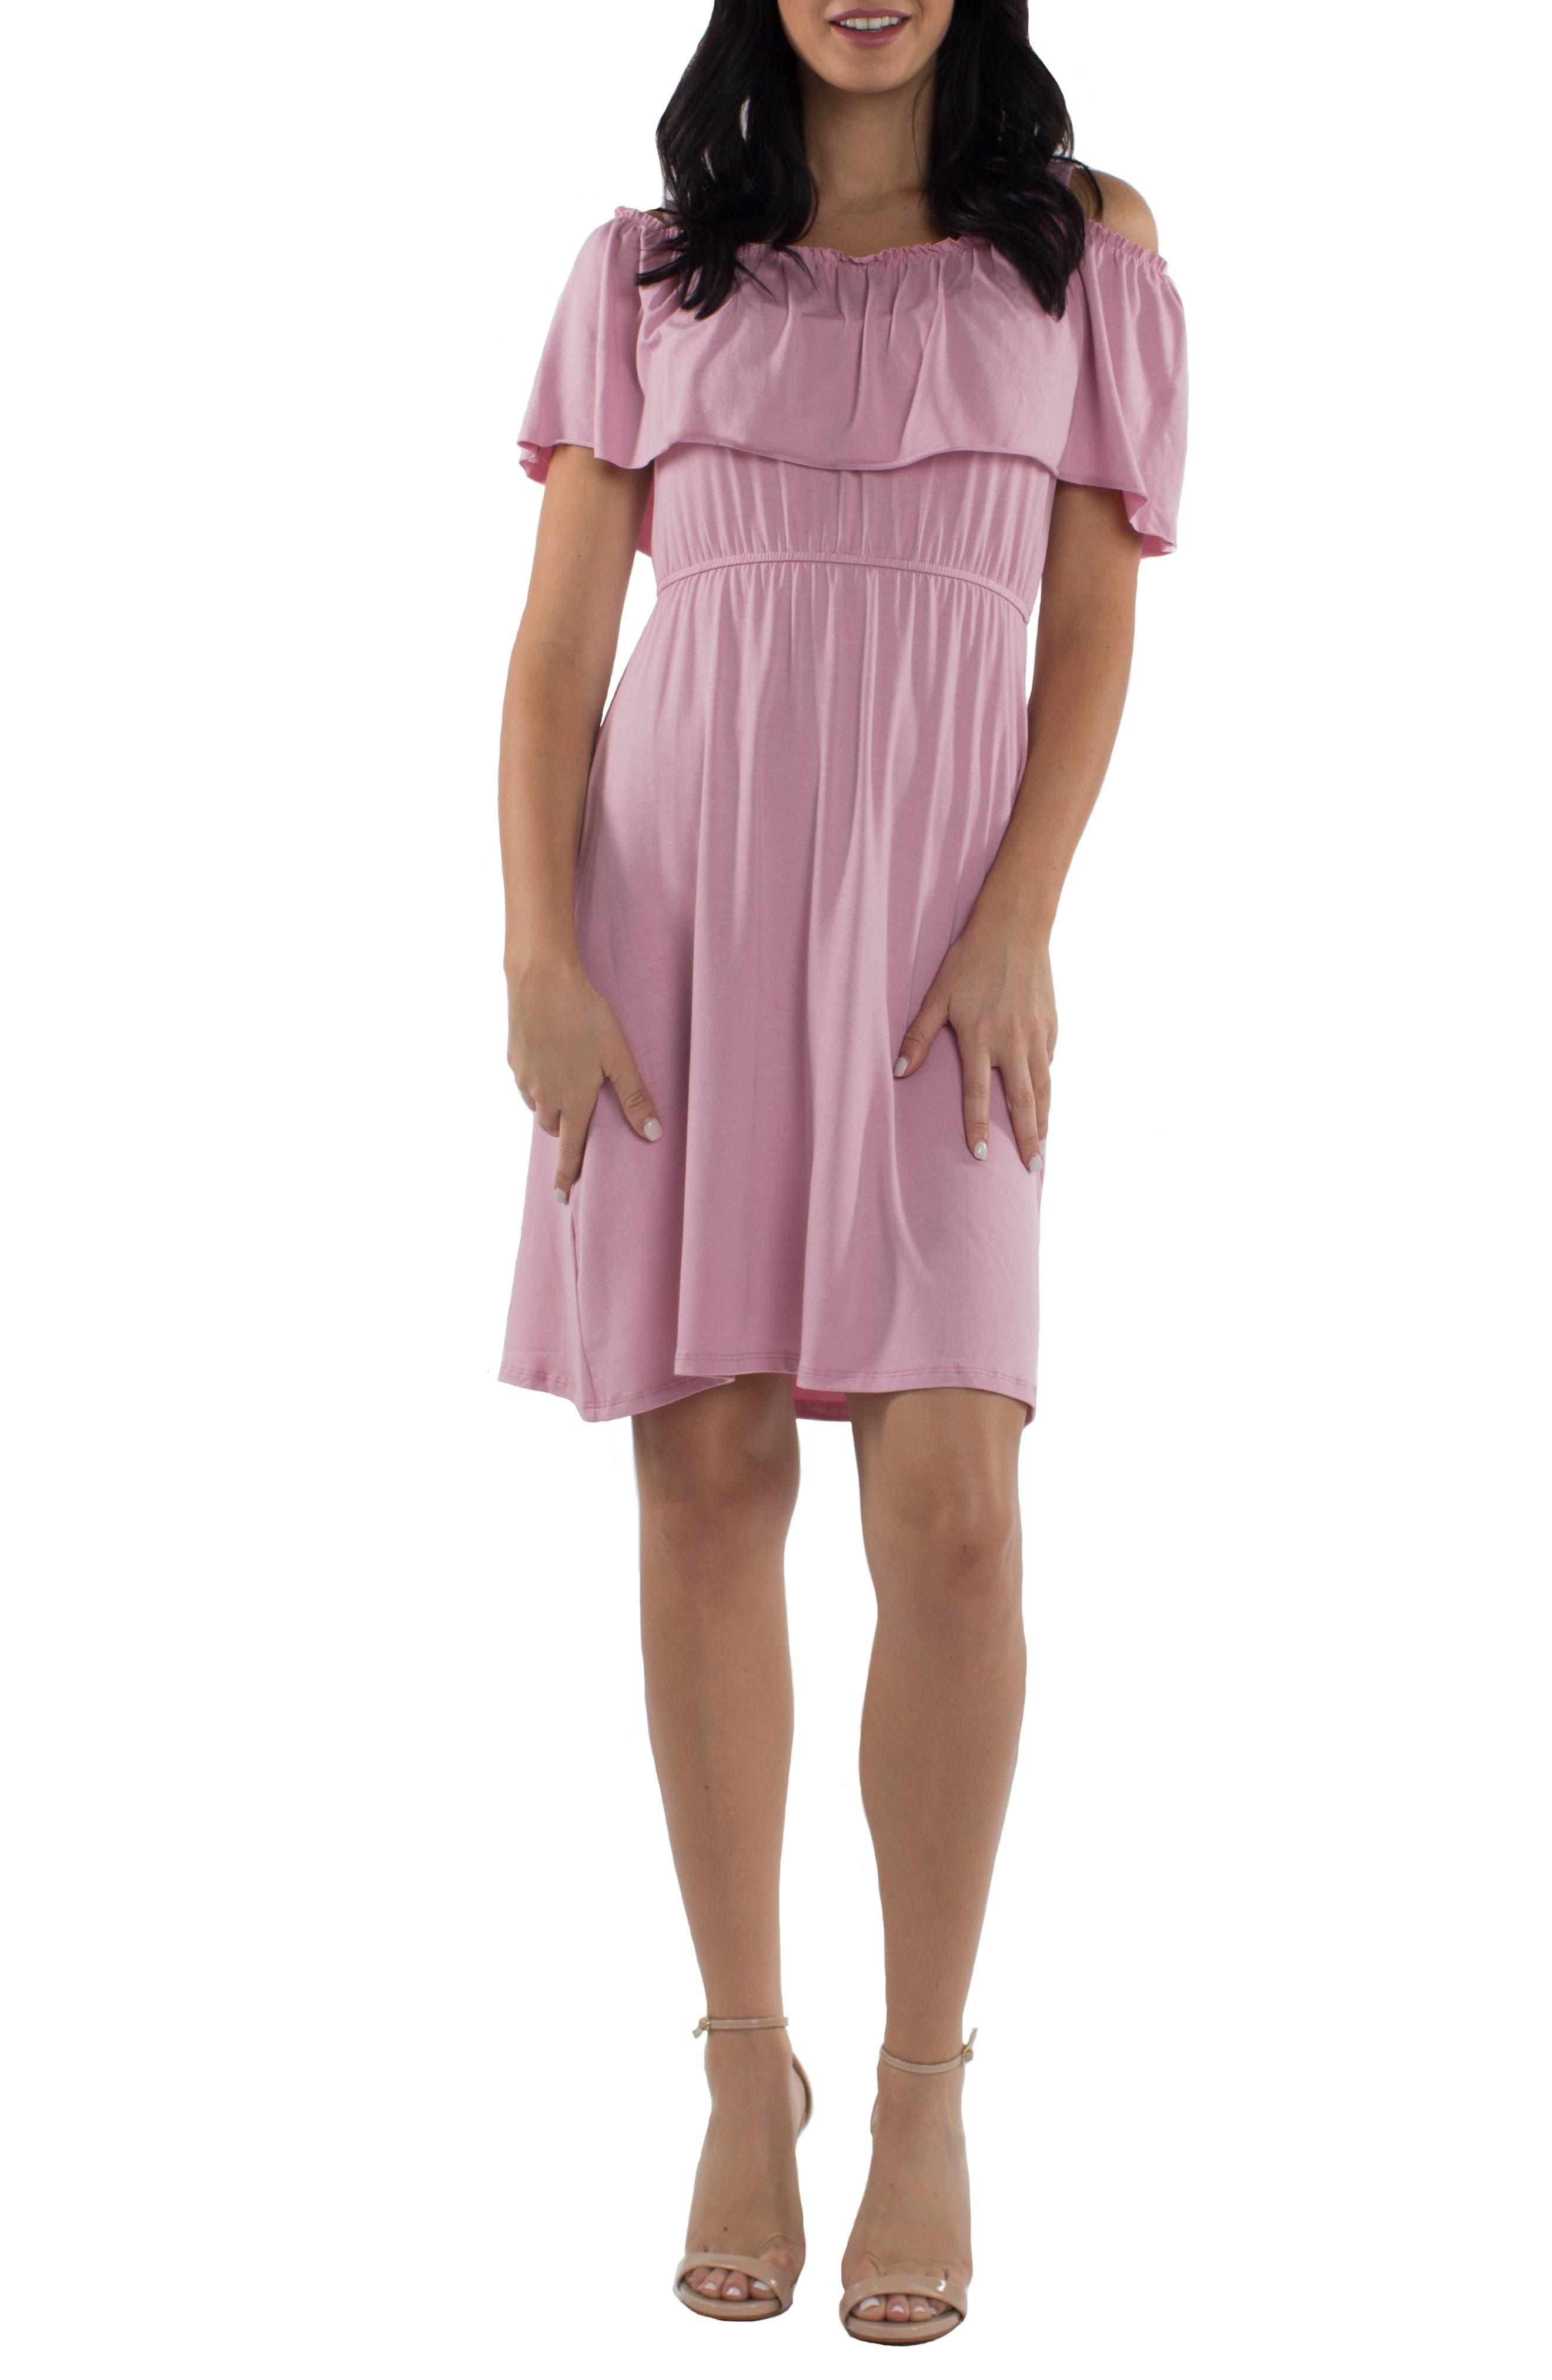 Udderly Hot Mama Reagan Maternity/nursing Dress, Pink